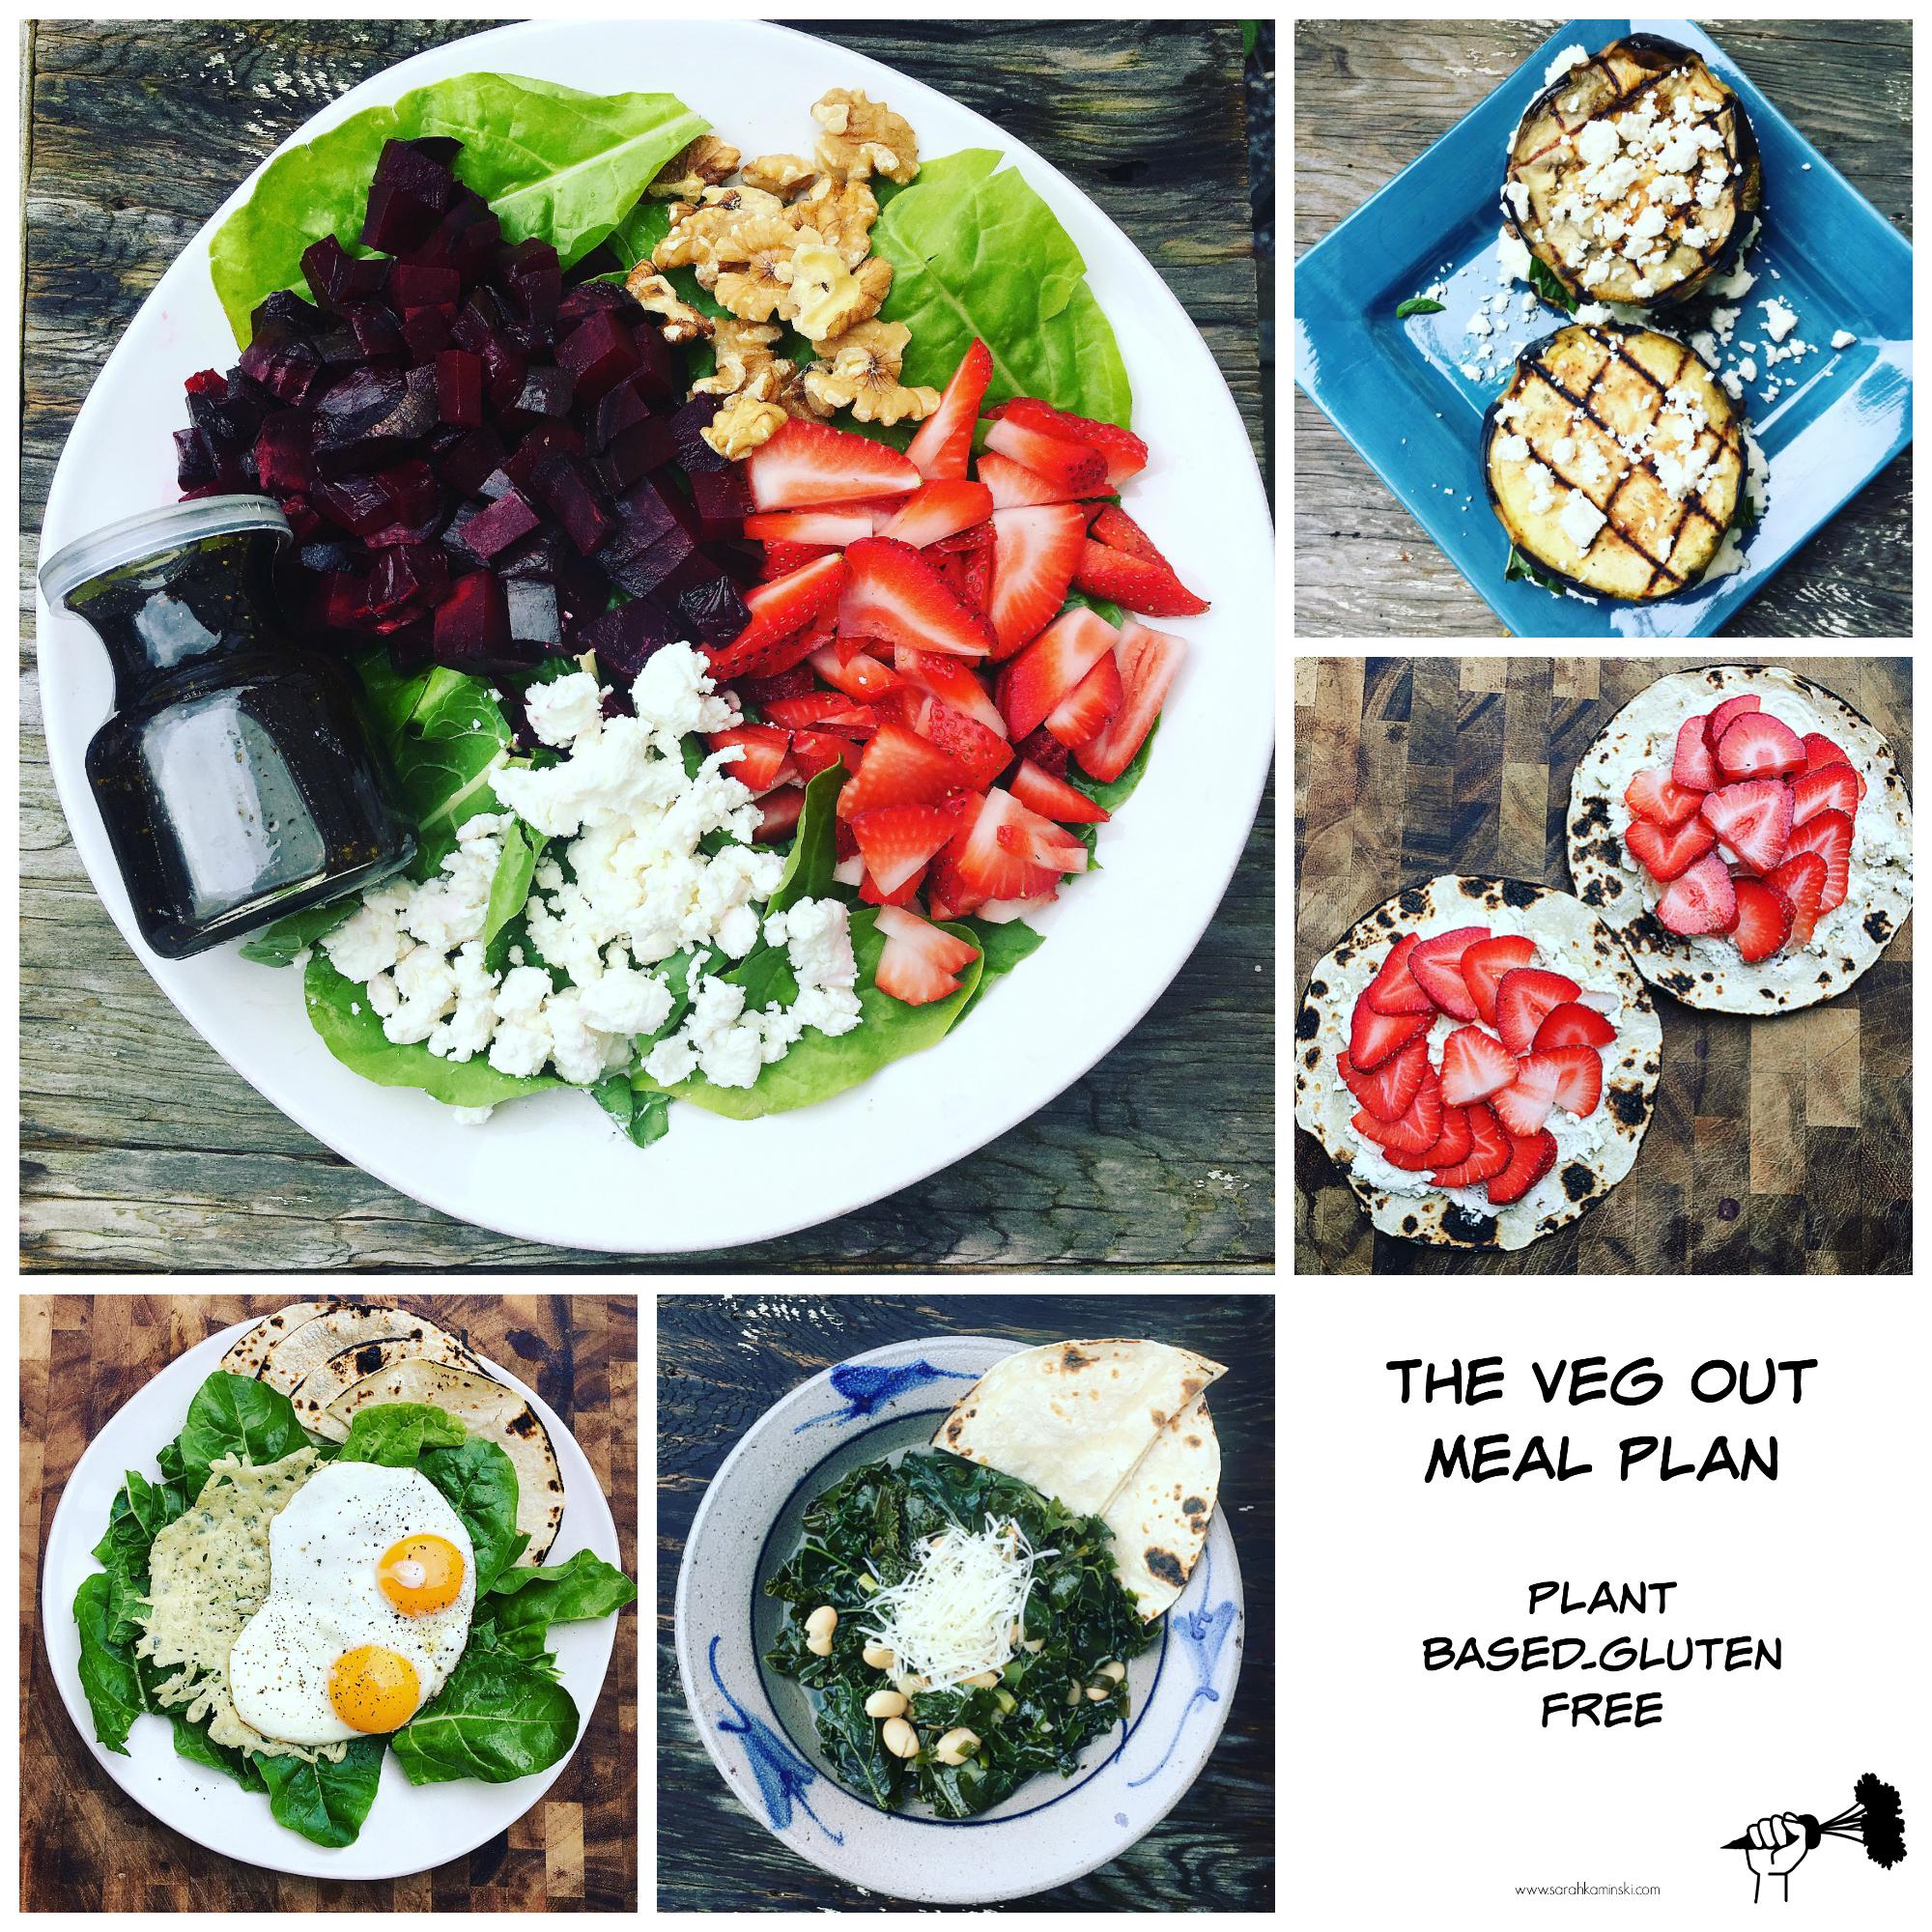 Plant Based, Gluten Free Recipes